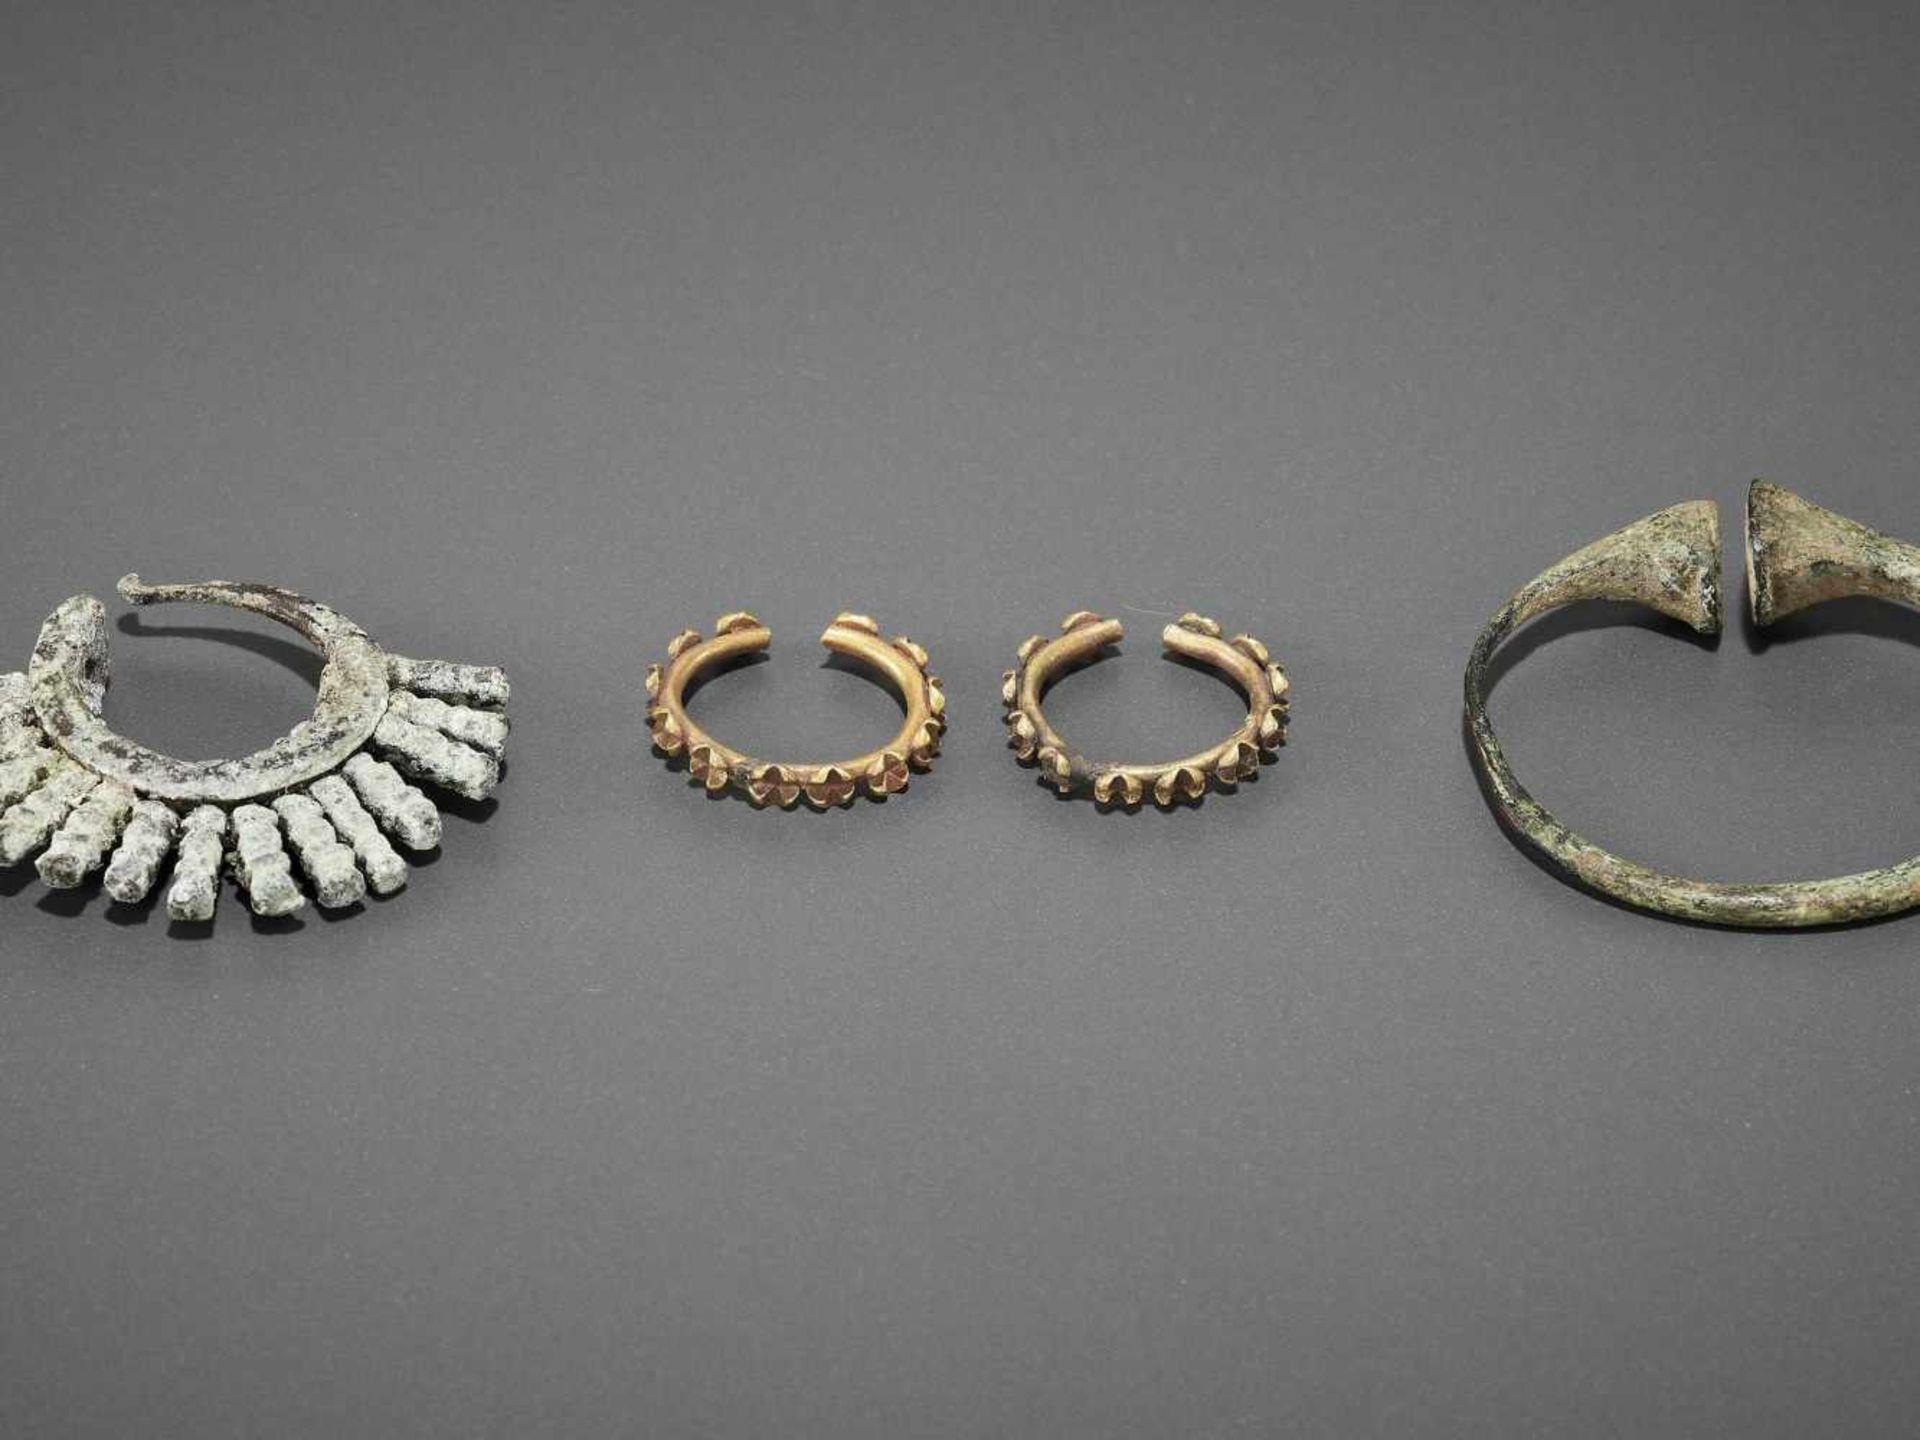 FIVE BACTRIAN GOLD AND BRONZE EARRINGS - Bild 6 aus 6